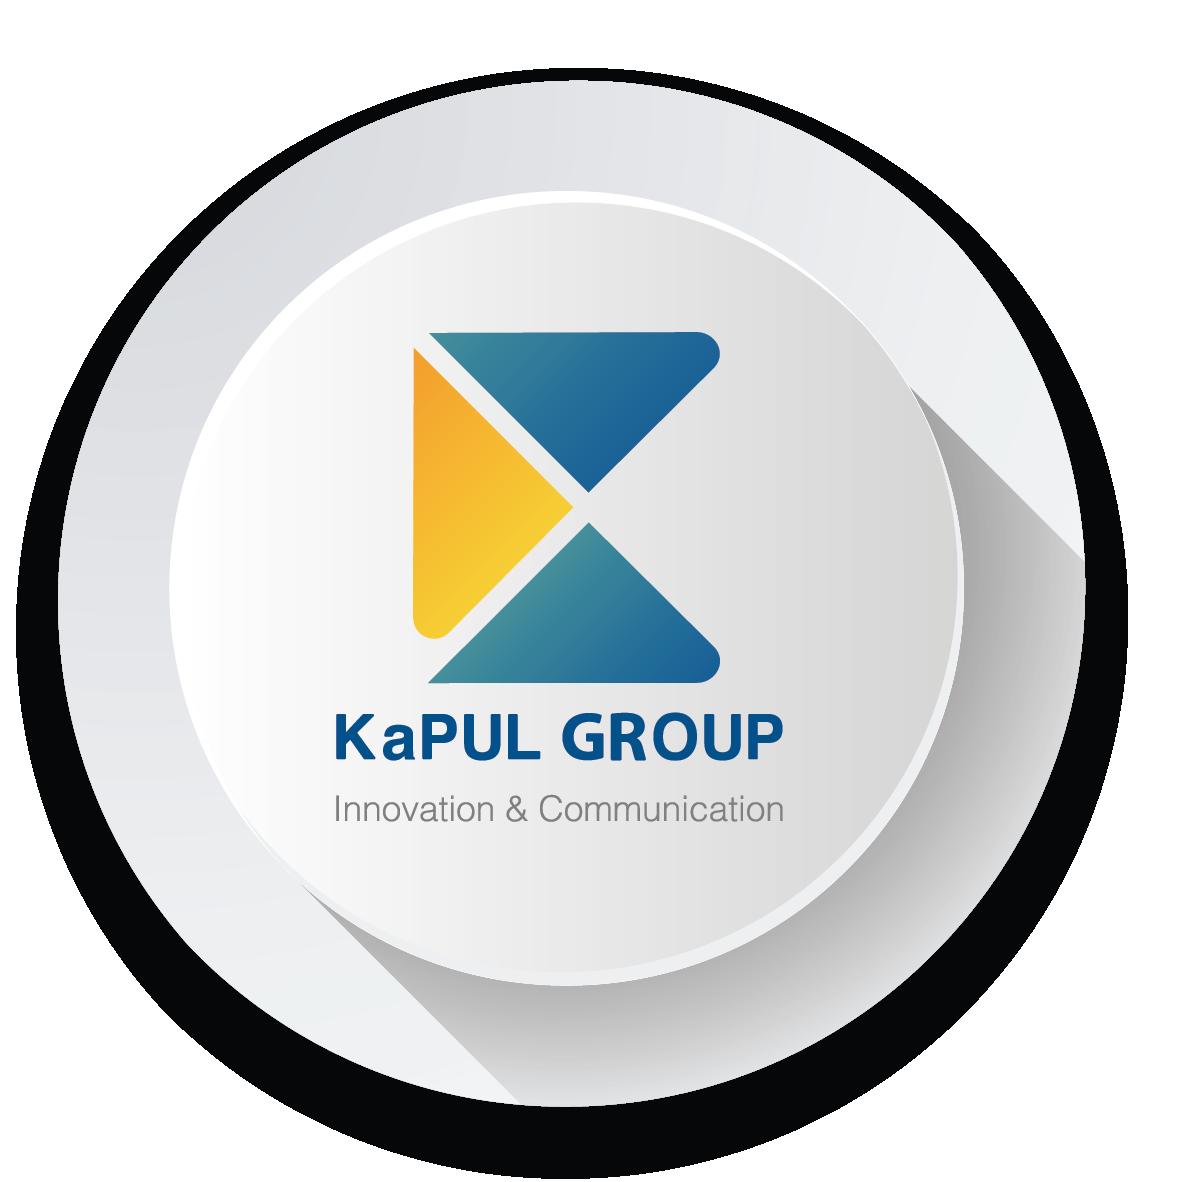 Kapul Group of companies